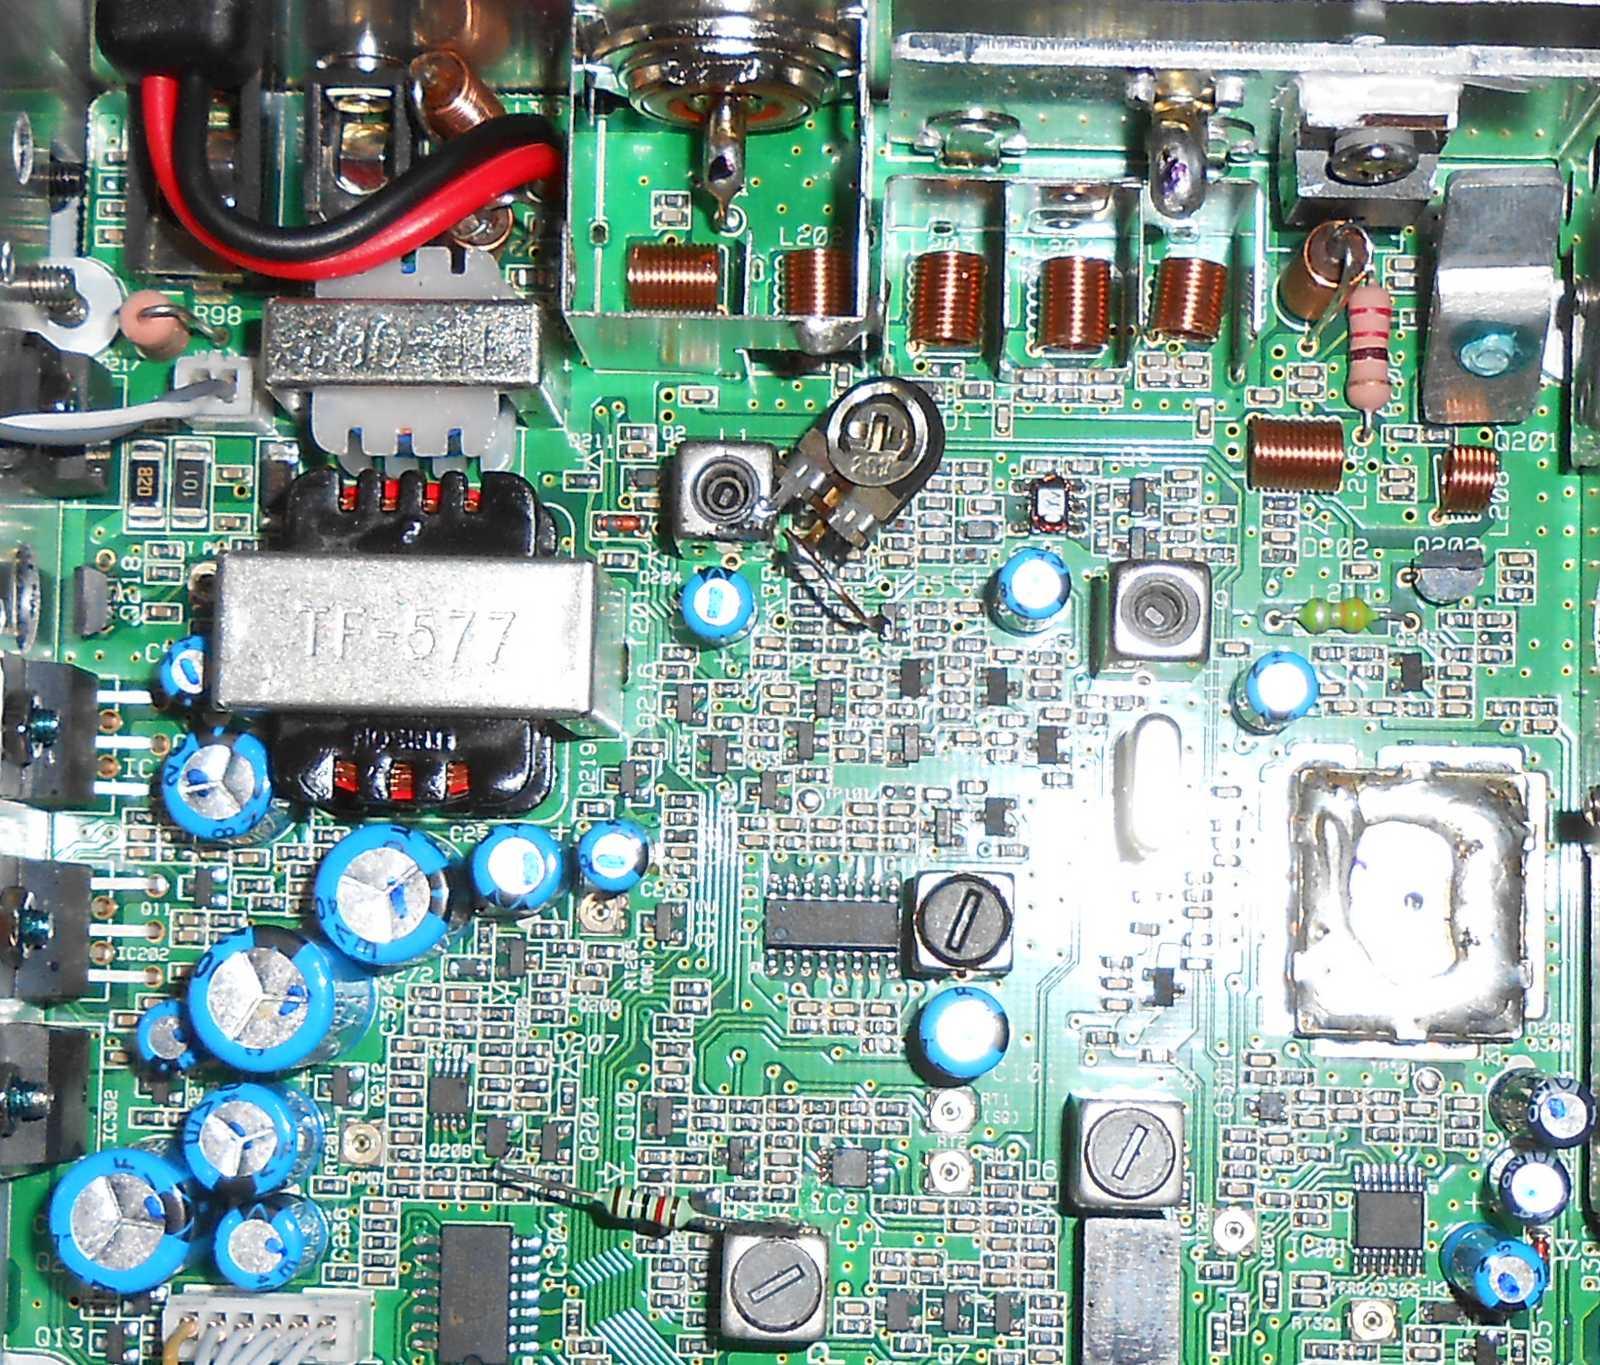 Mtech Legend Iii Poprawa Funkcji Lo Dx Elektroda Pl